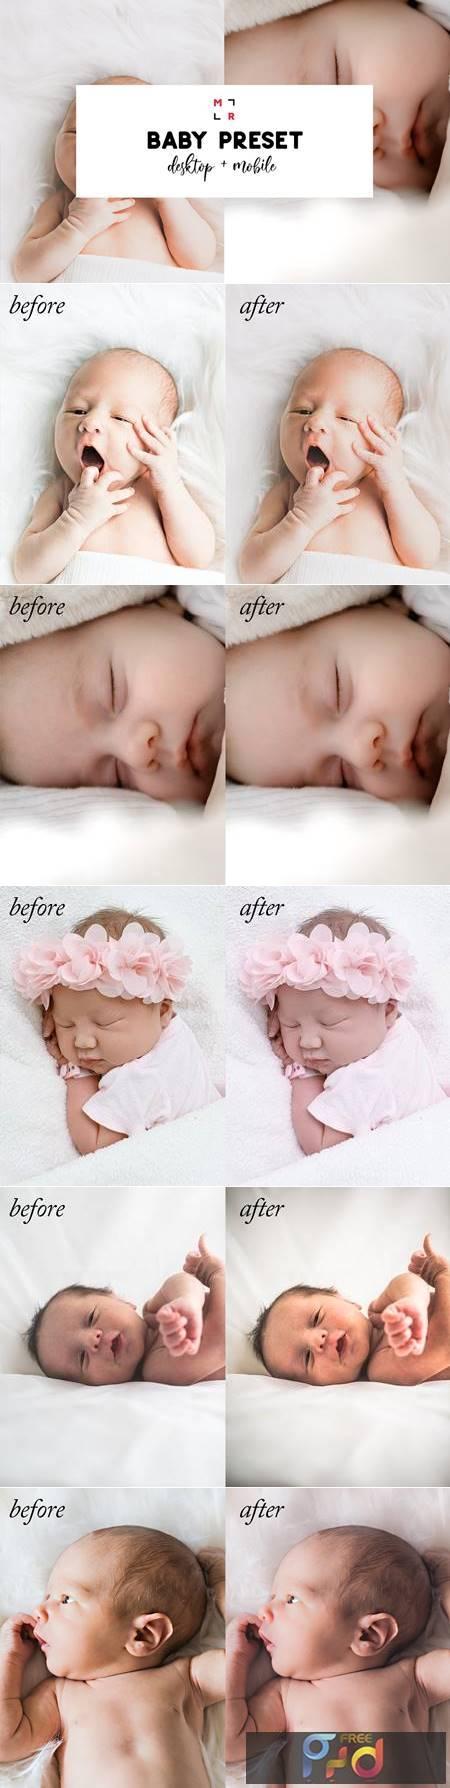 Baby Presets 5702258 1